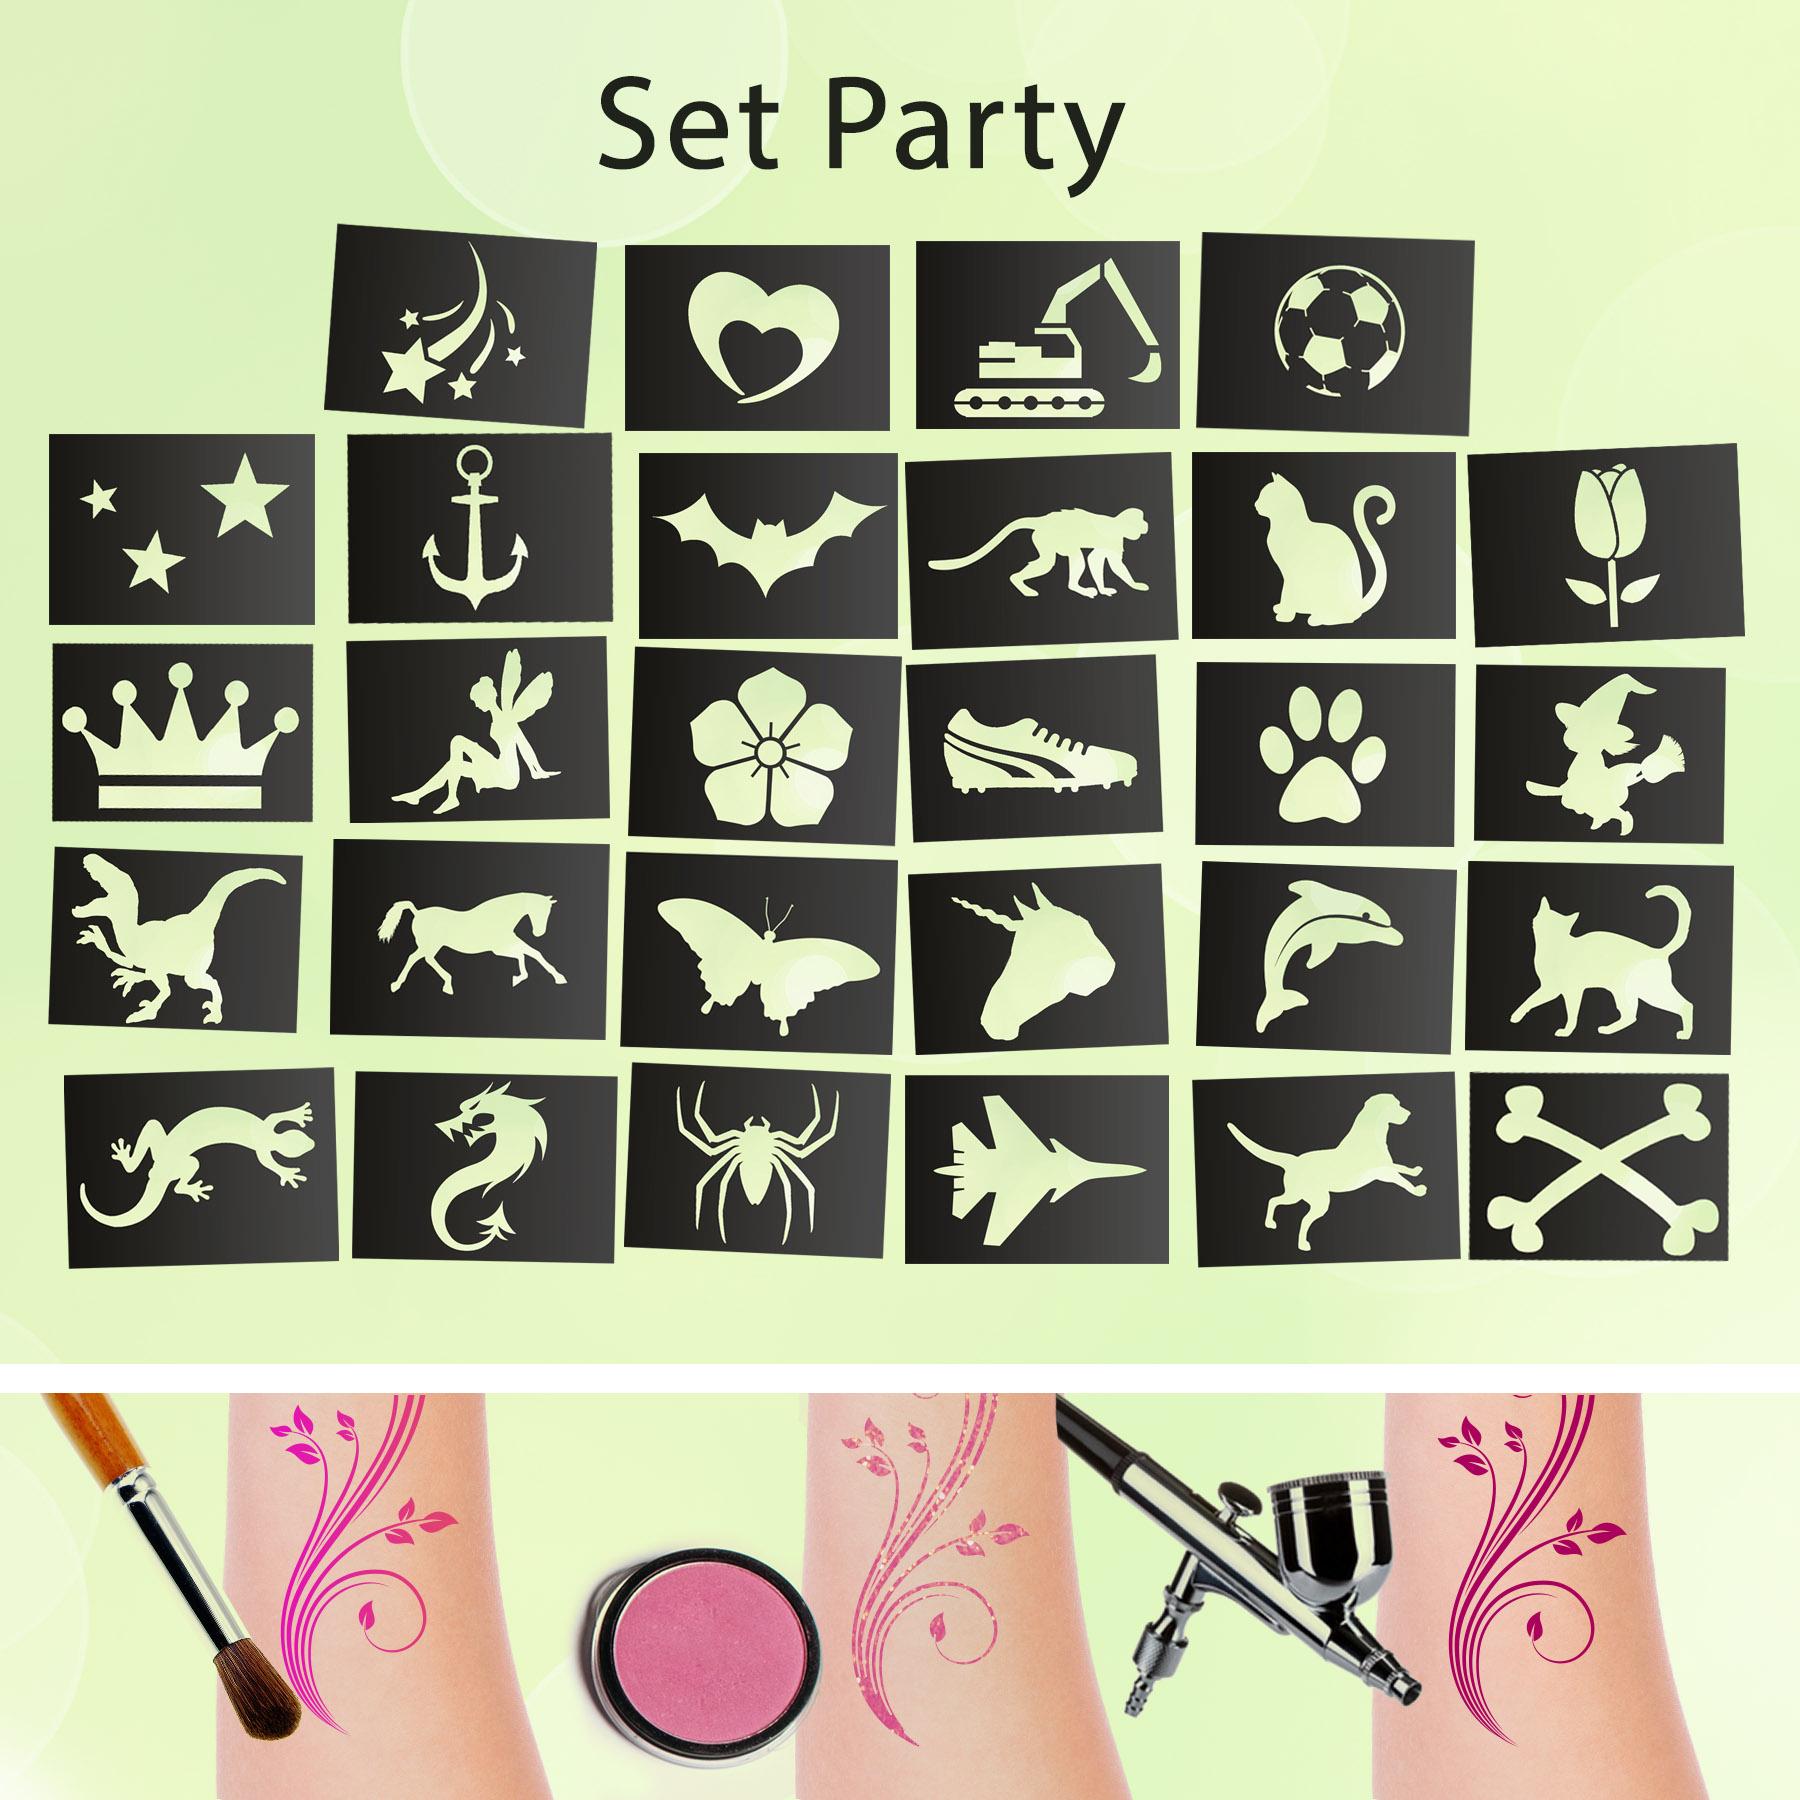 Tattoo Schablonen SET Party (28 Stück) Selbstklebend Kinderschminken Airbrush